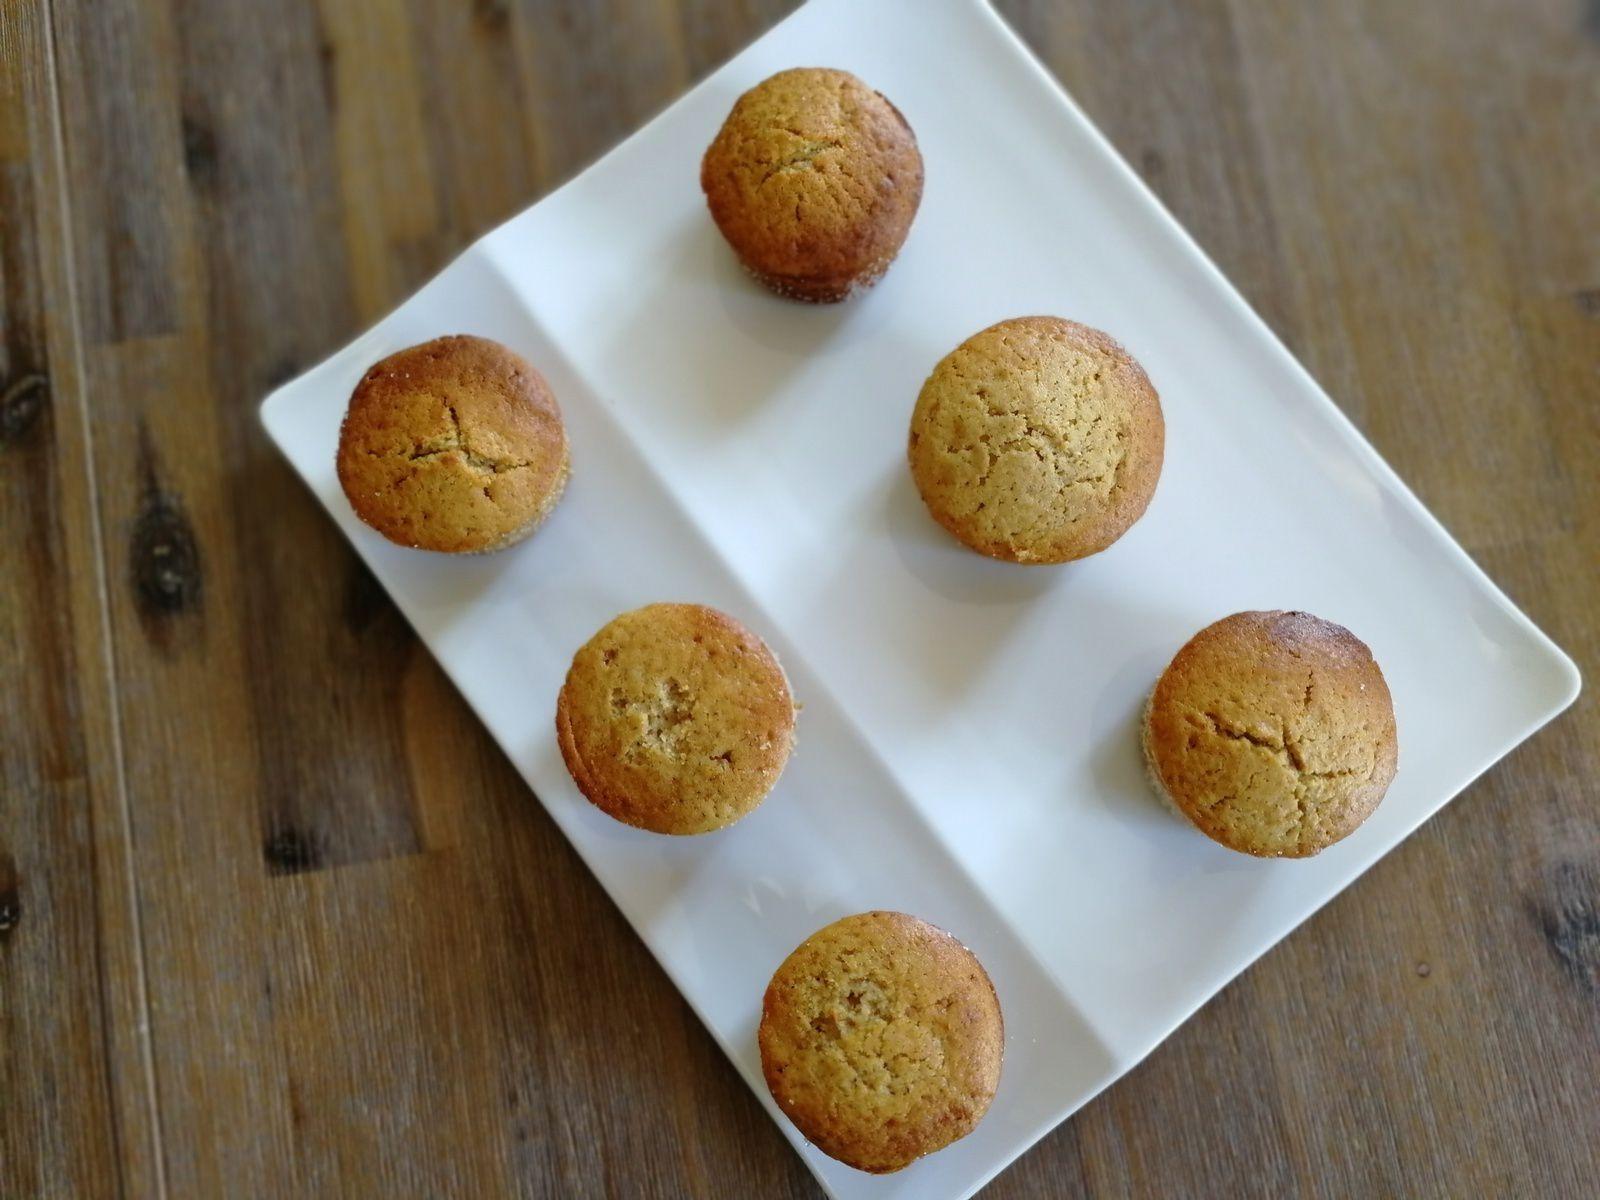 Doffins (mi muffins/mi donuts) - fourrés à la pâte à tartiner